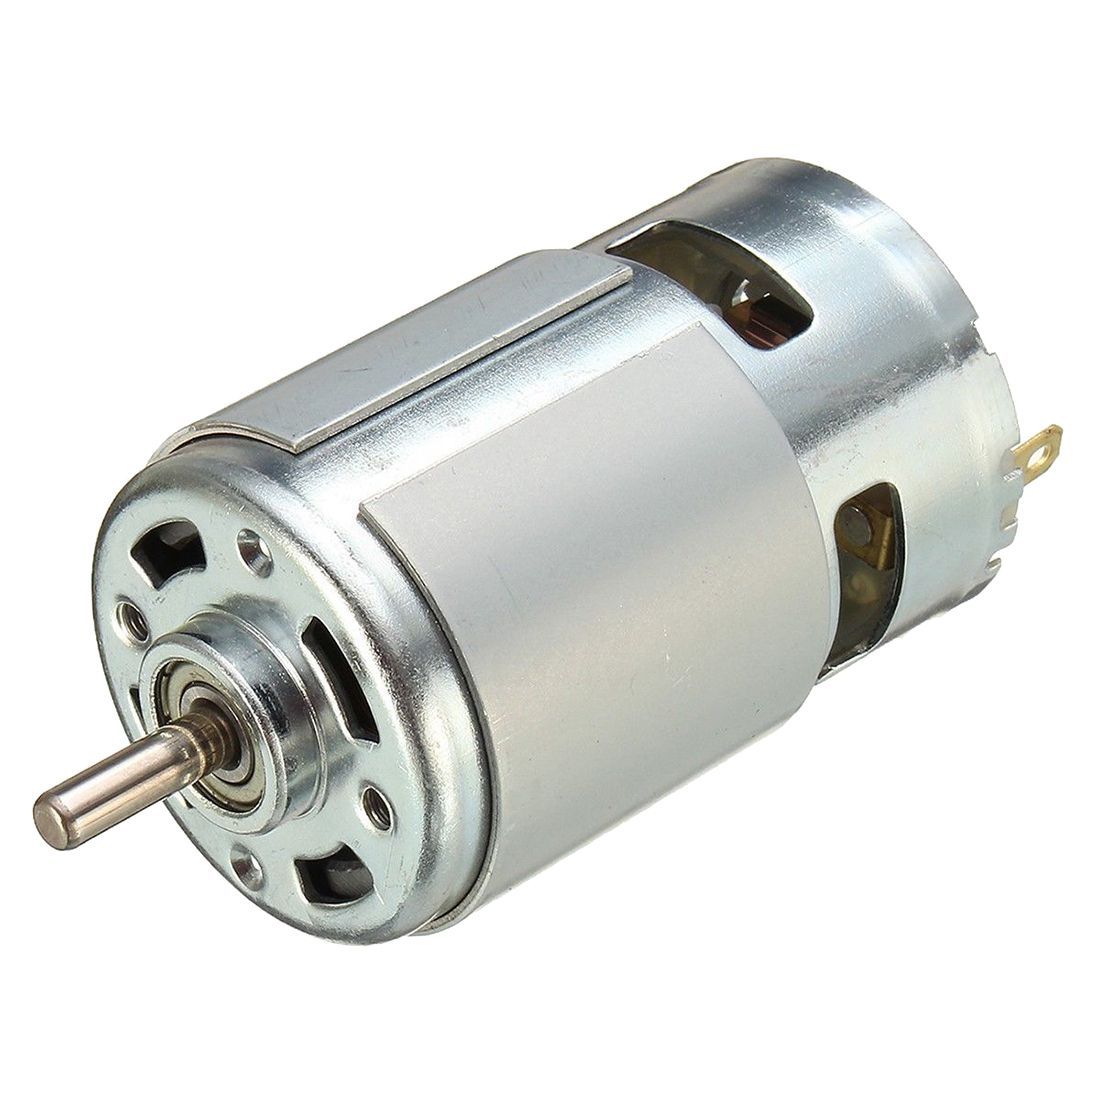 775 DC 12V-36V 3500-9000RPM Motor Large Torque Ball Bearing High Power Low Noise775 DC 12V-36V 3500-9000RPM Motor Large Torque Ball Bearing High Power Low Noise